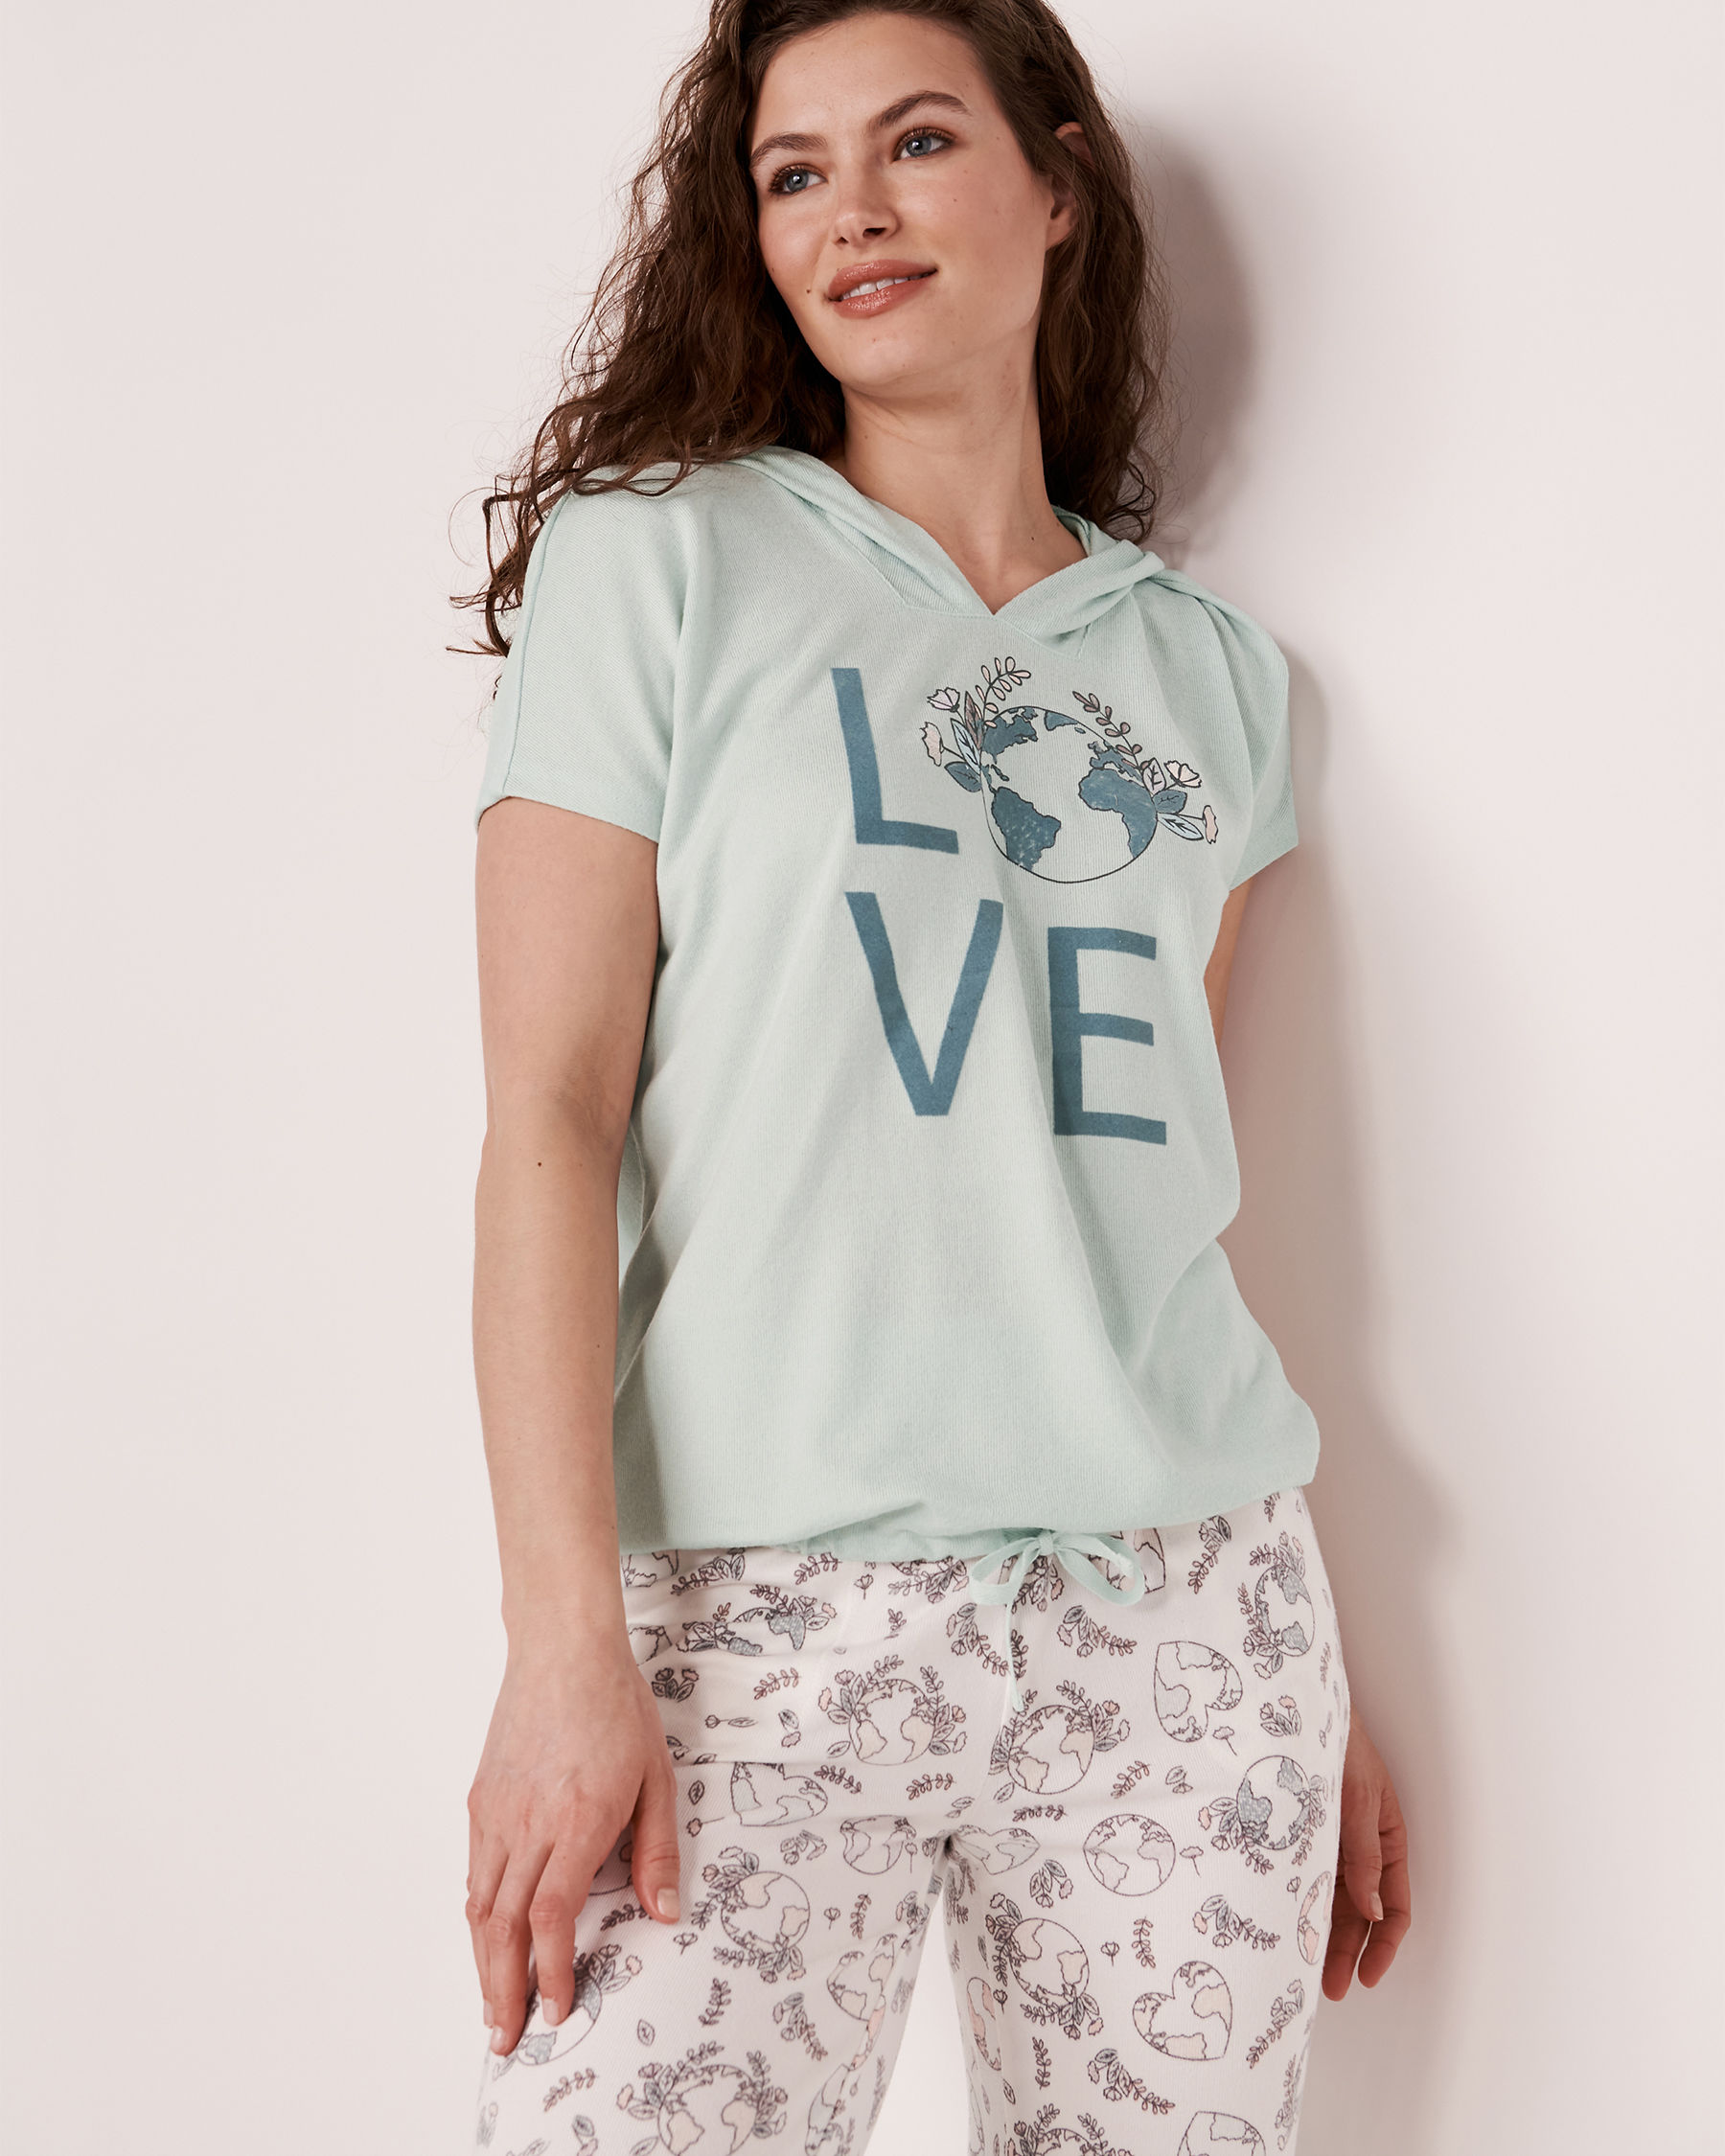 LA VIE EN ROSE Recycled Fibers Hooded T-shirt Blue mix 40100039 - View3